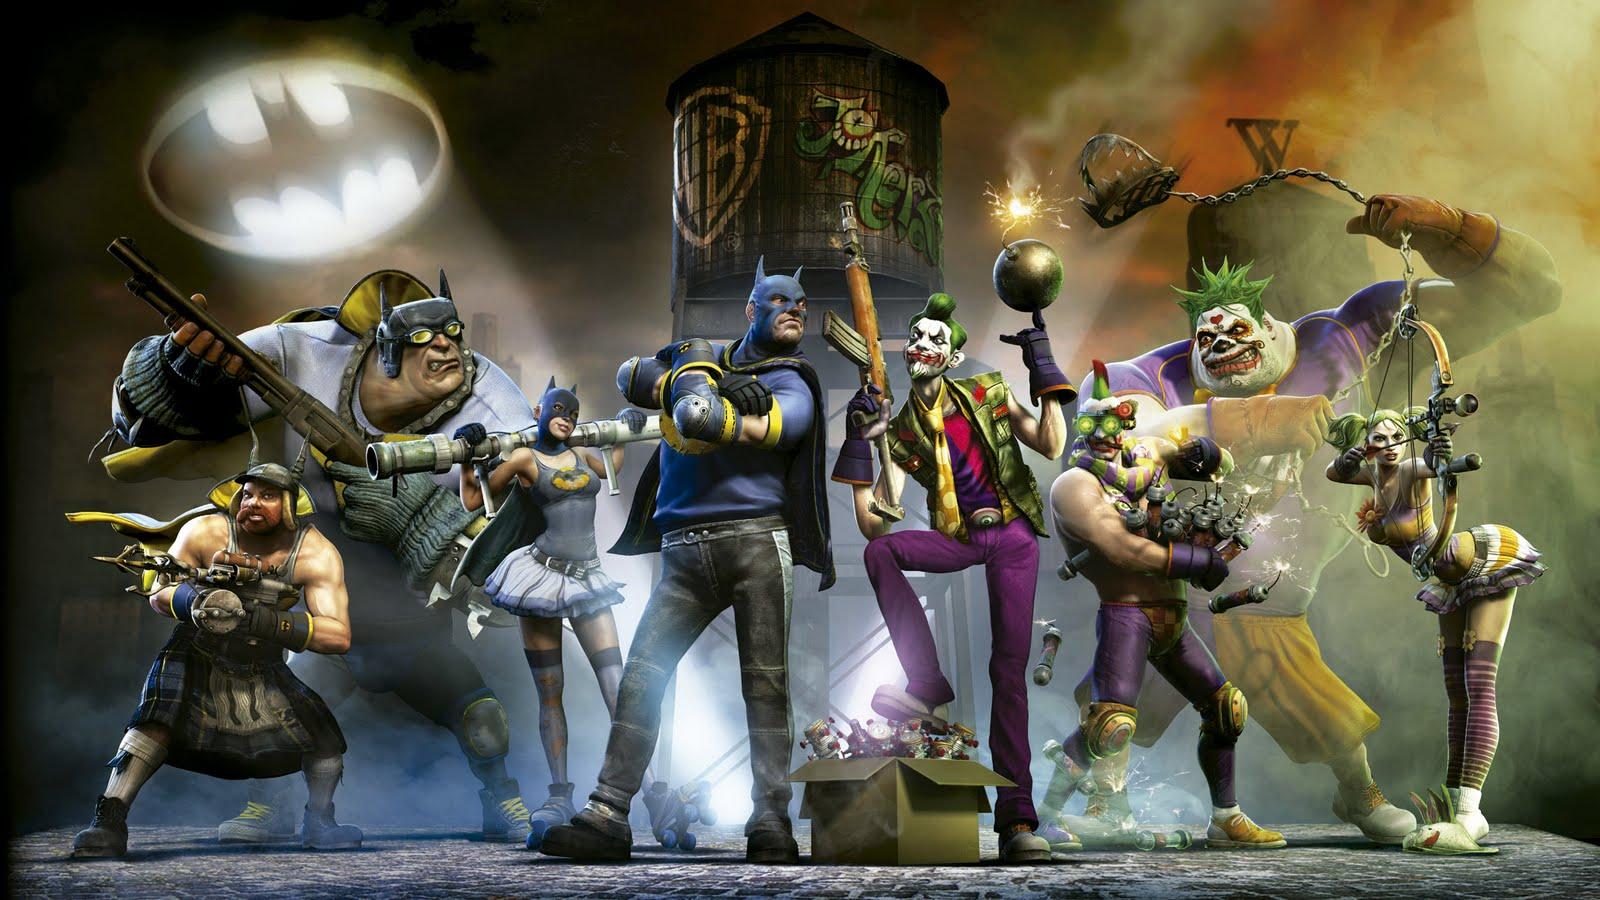 http://3.bp.blogspot.com/-Wxi-Kbc9rtI/Te2Rp9RE_2I/AAAAAAAAFDw/xo8NjaWOD84/s1600/Batman-impostors-wallpaper.jpg